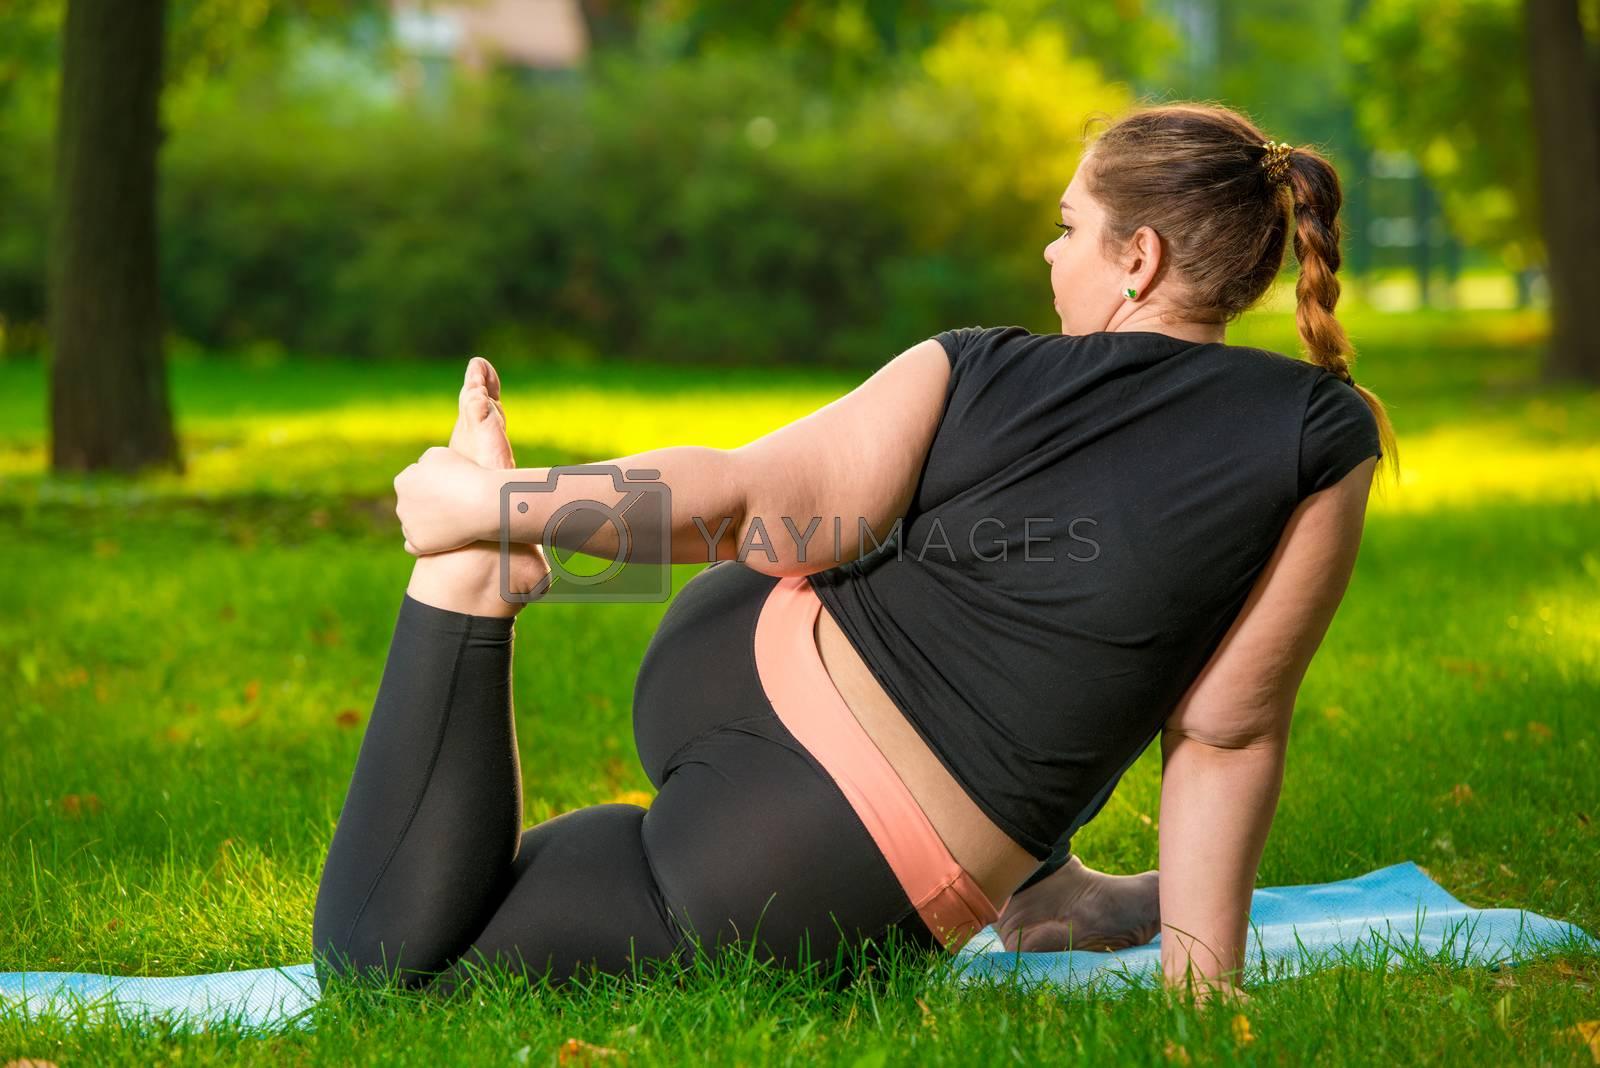 fat woman in the park doing yoga, plus size woman is very flexib by Labunskiy K.